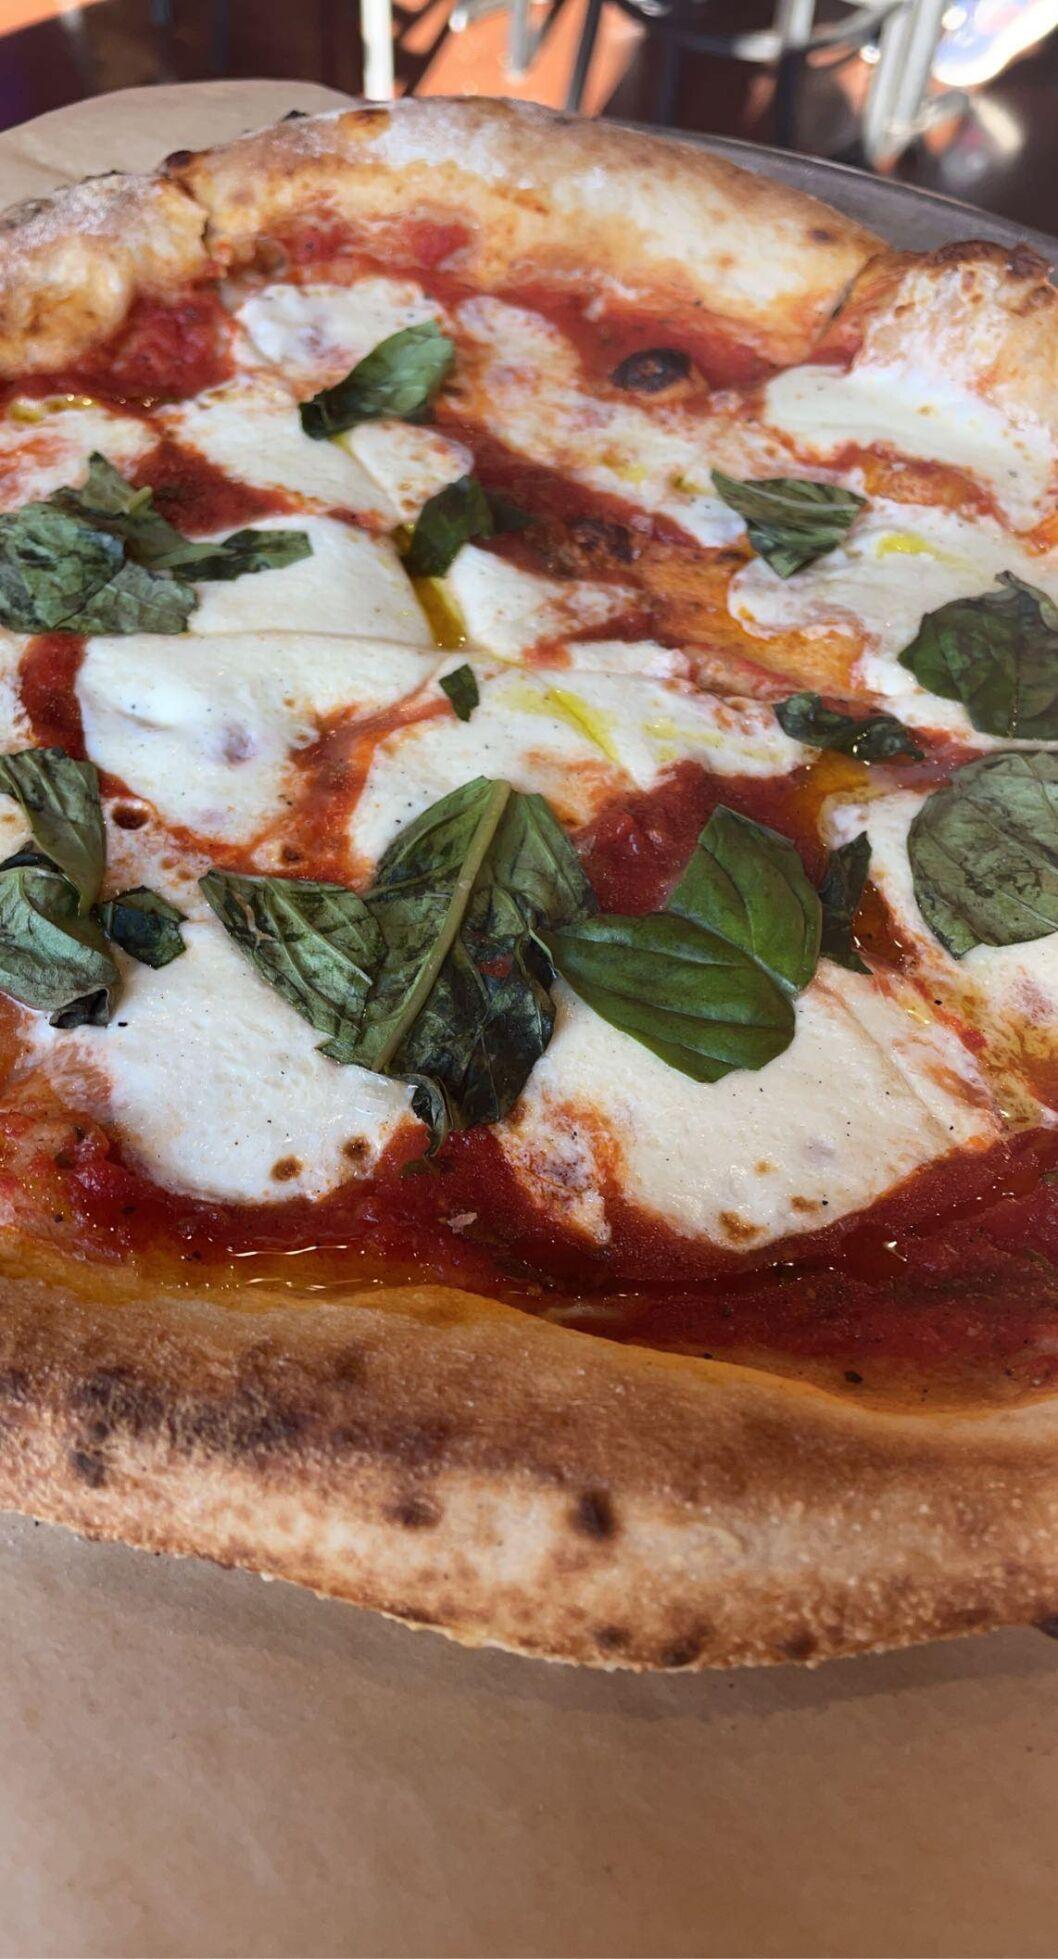 Lost Province pizza